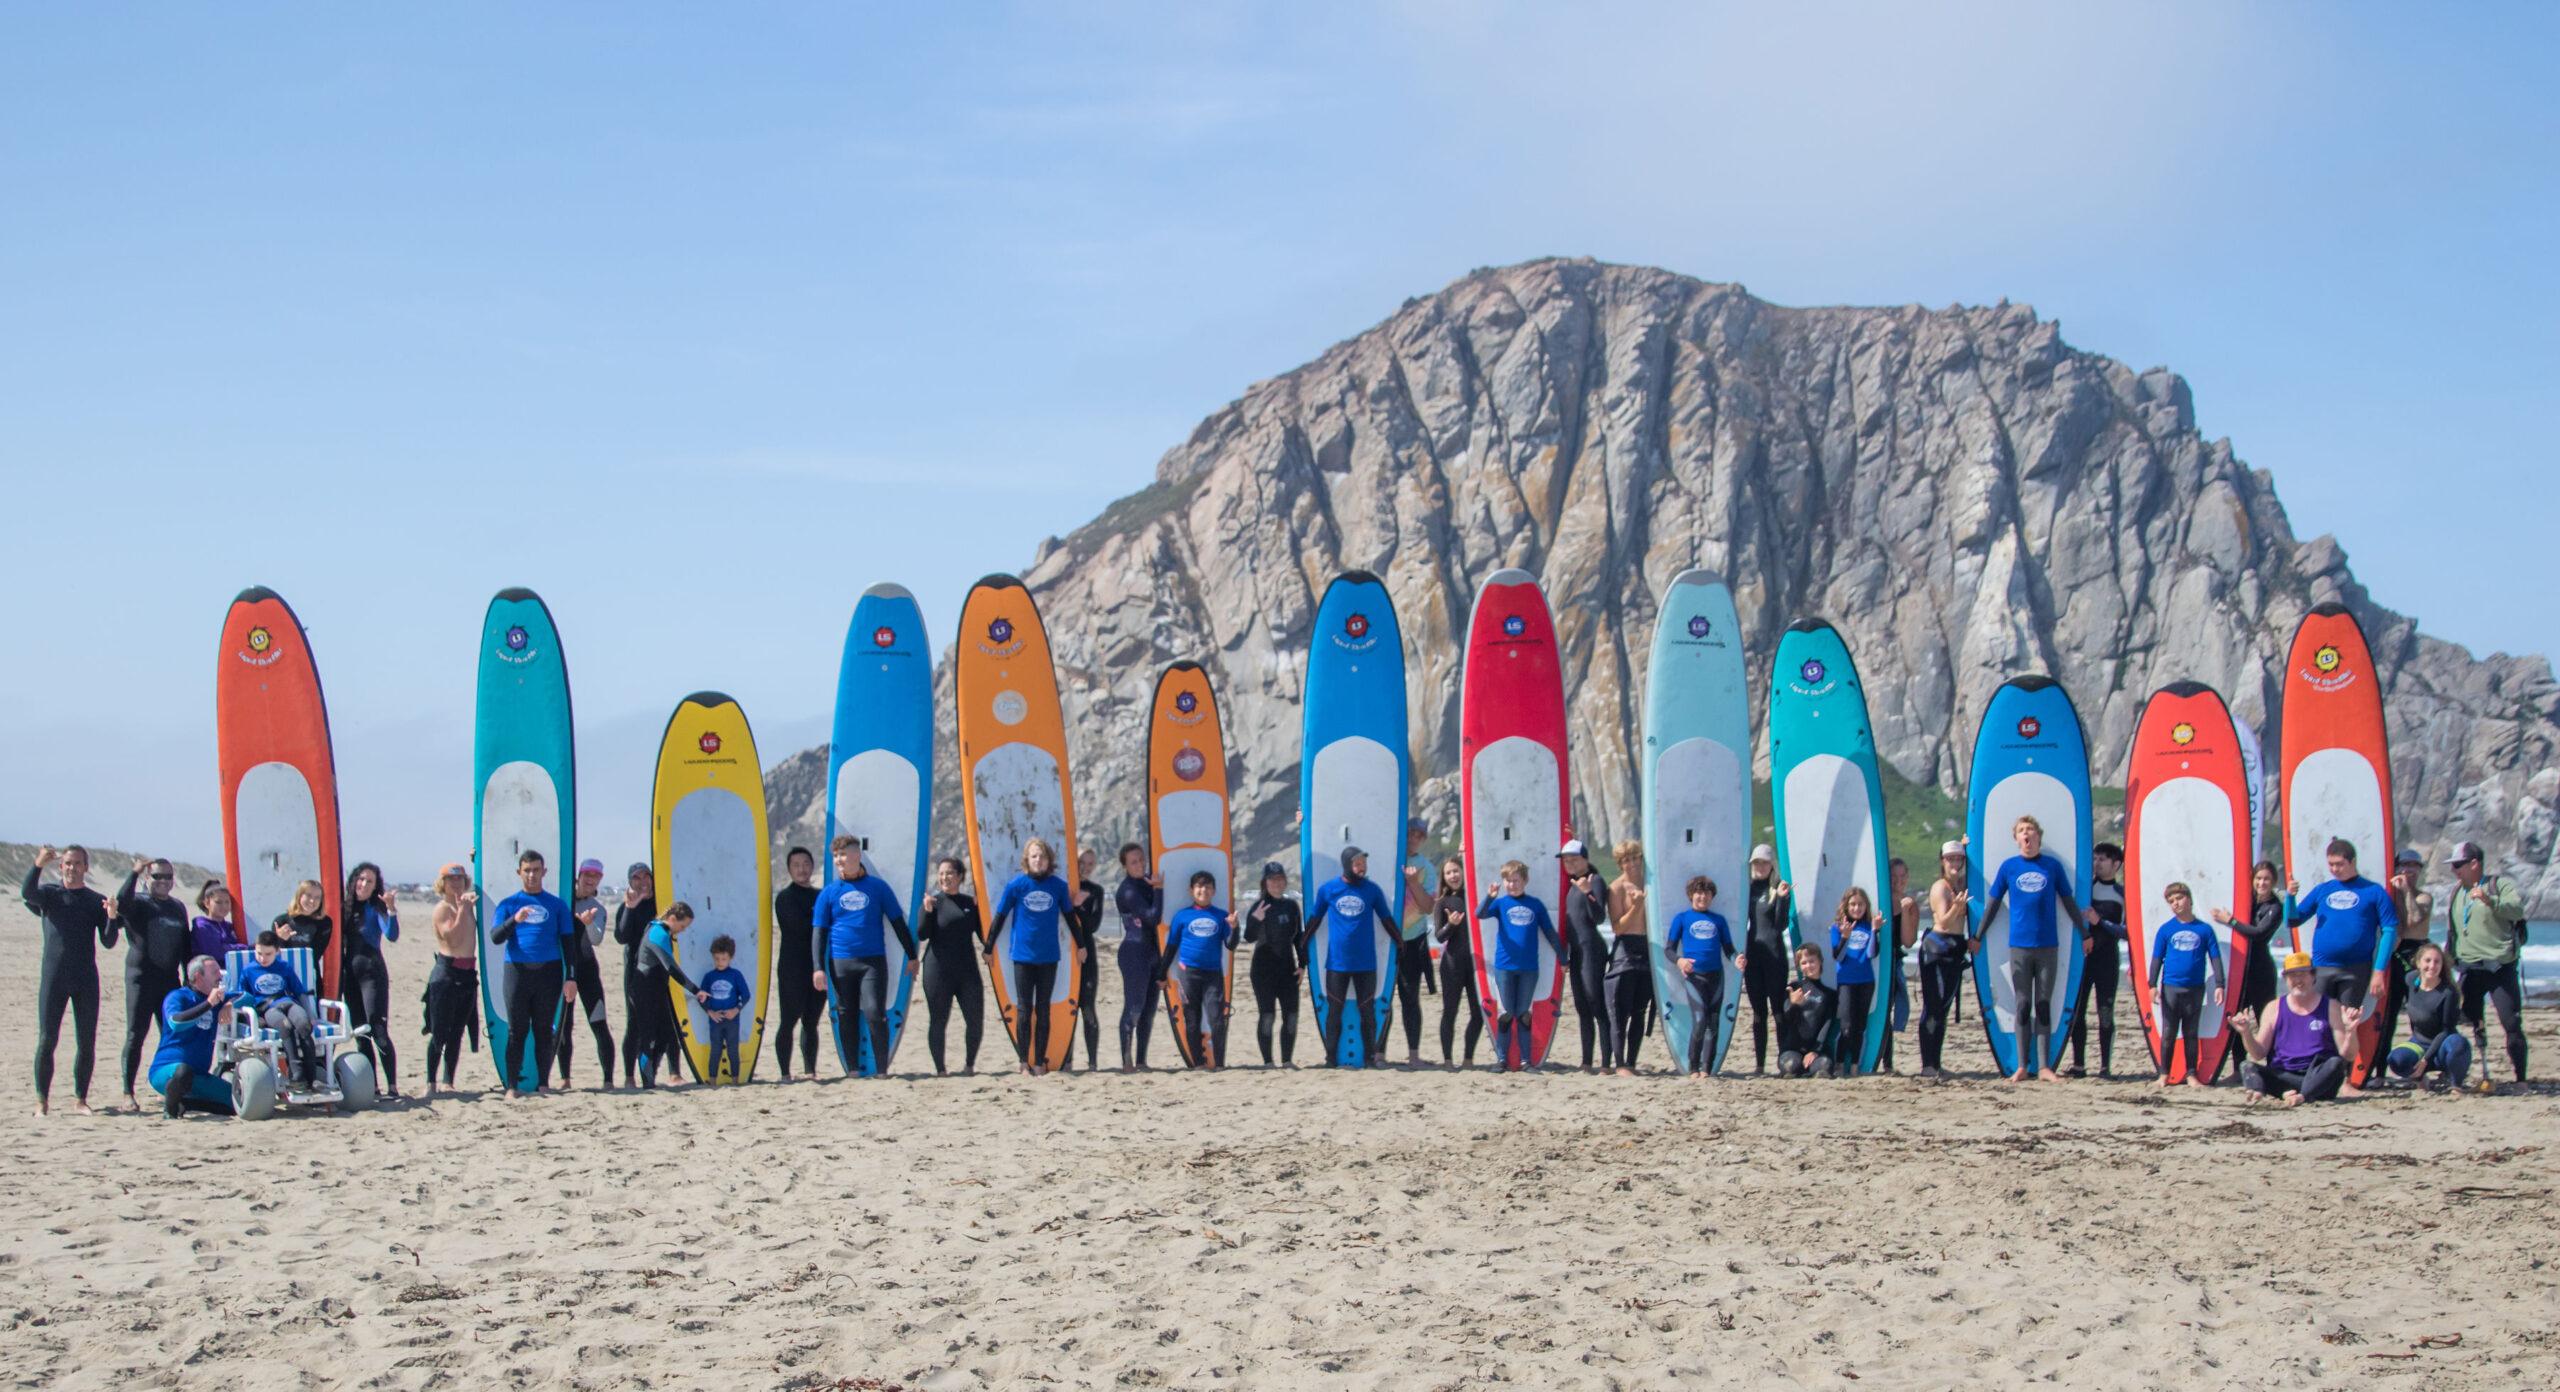 Proejct Surf Camp, Morro Bay